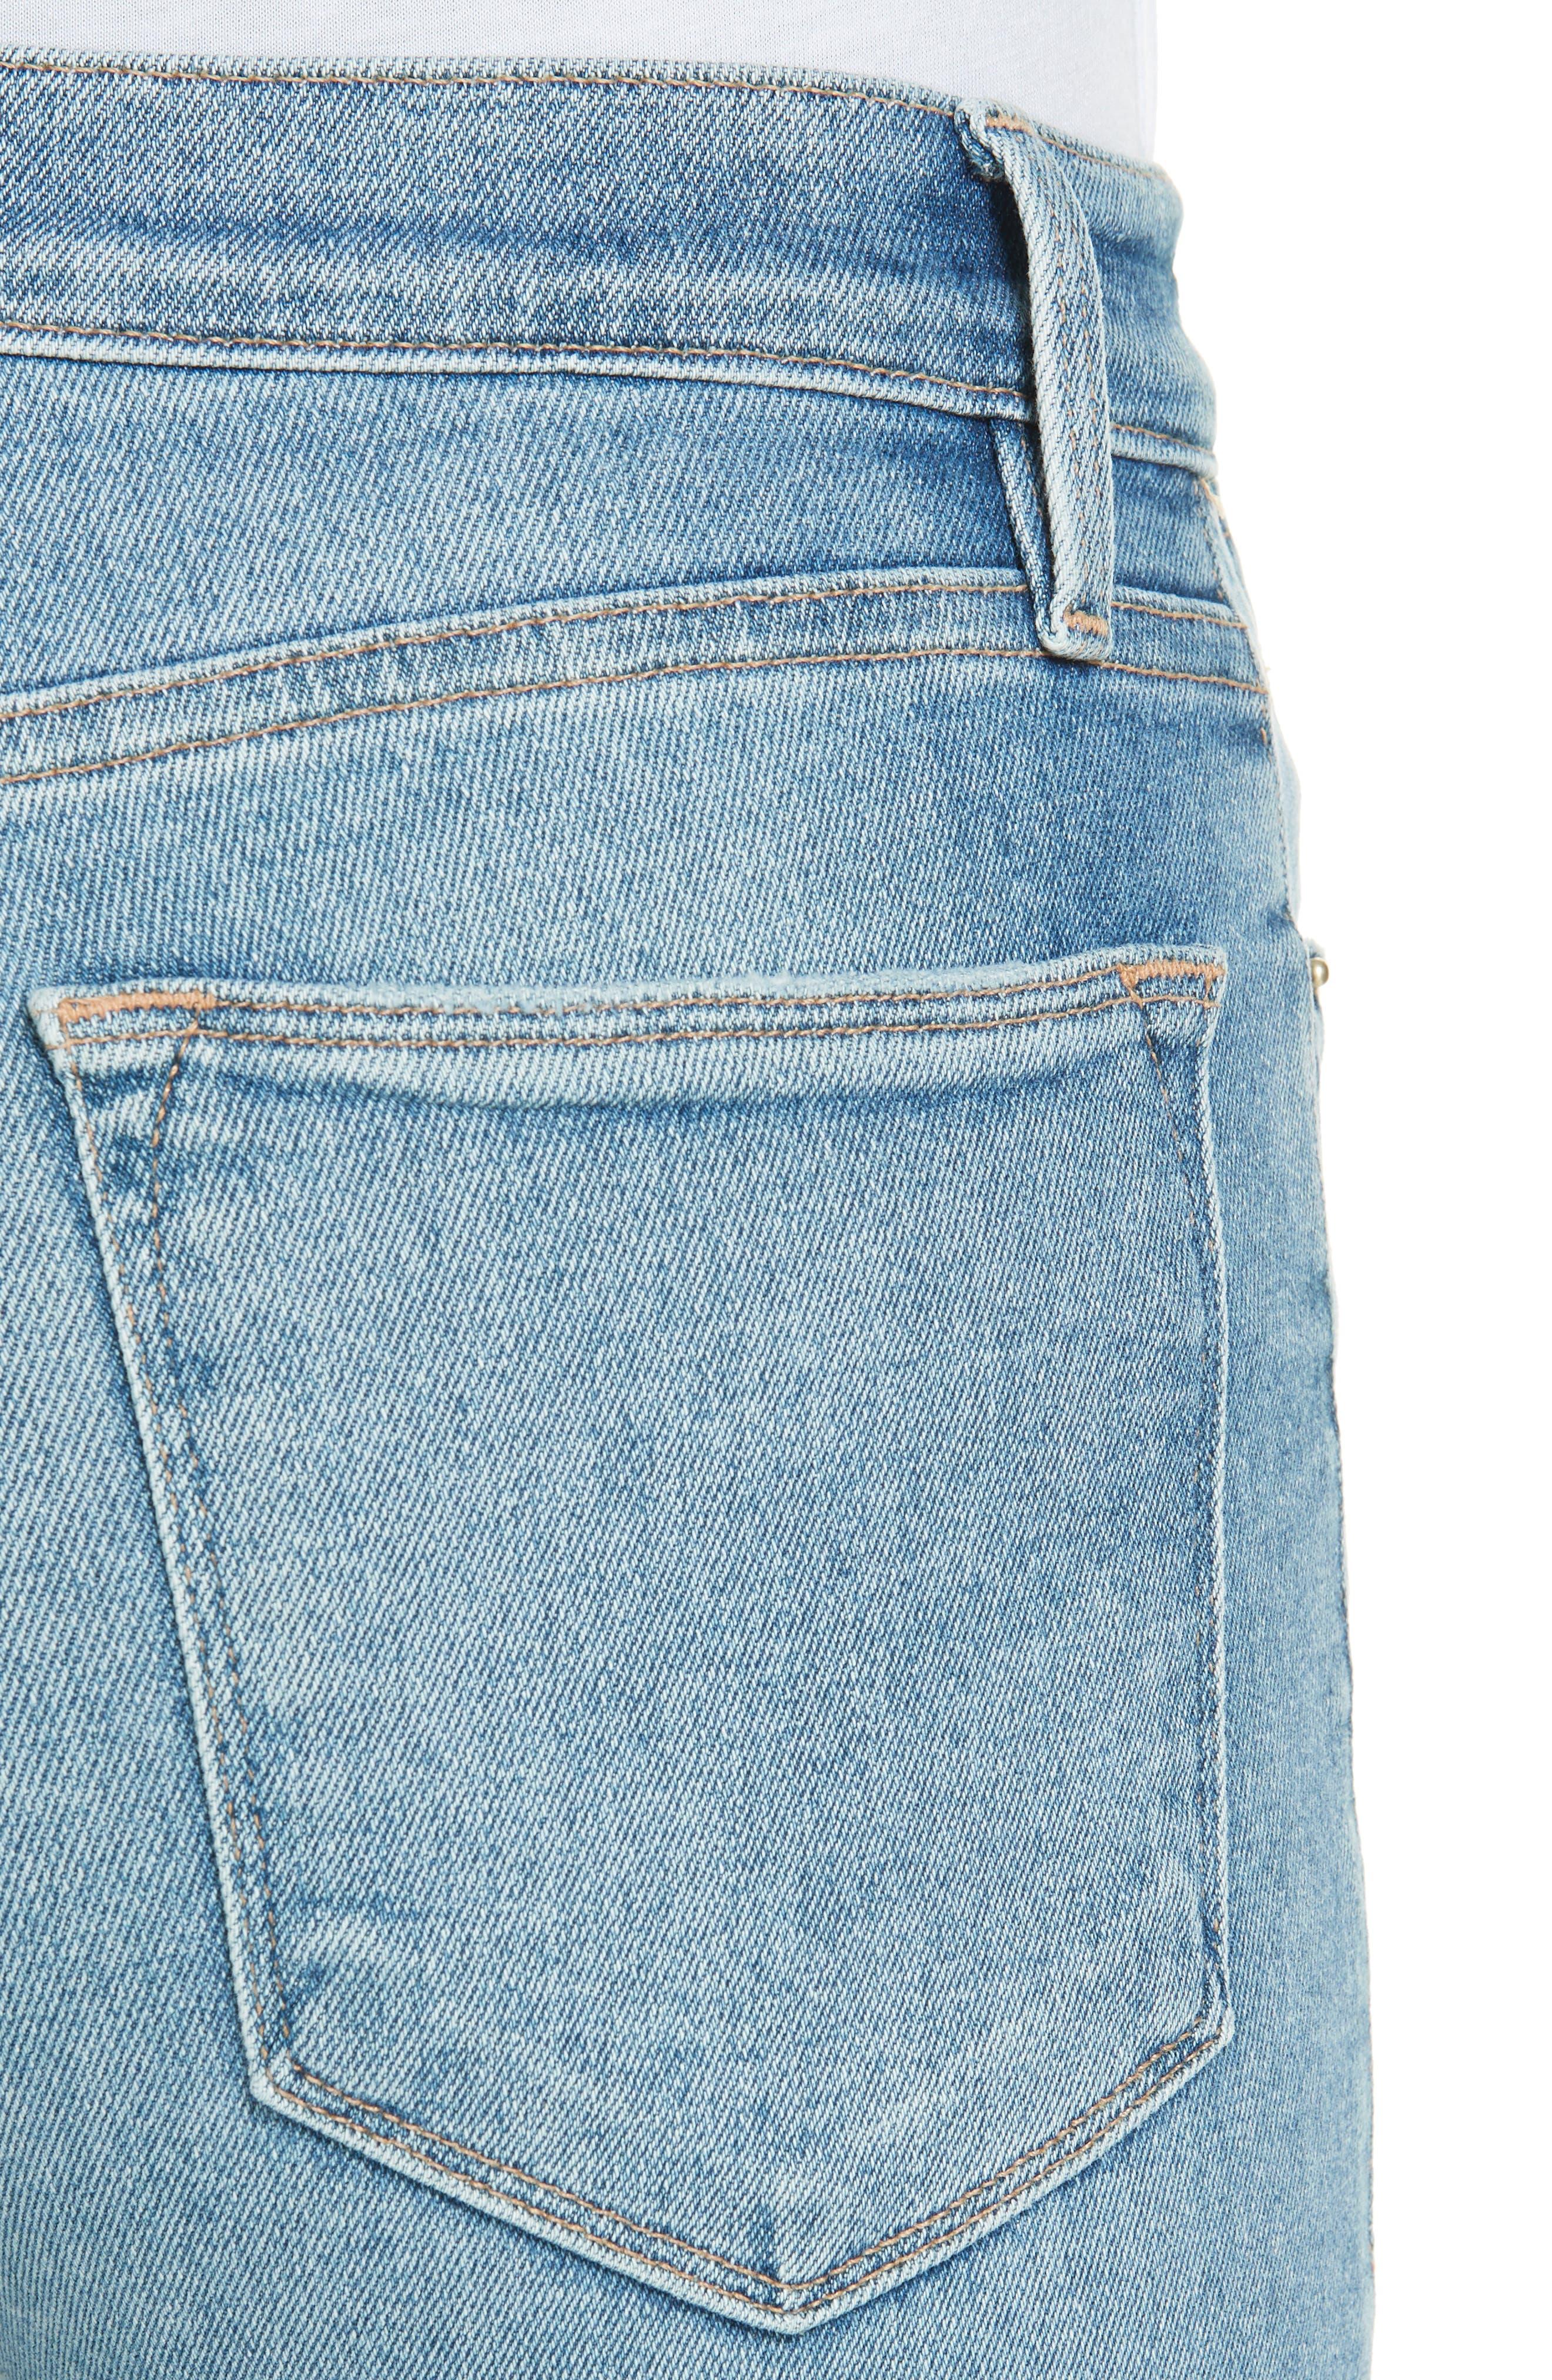 Le High Skinny Jeans,                             Alternate thumbnail 4, color,                             DUPONT DRIVE